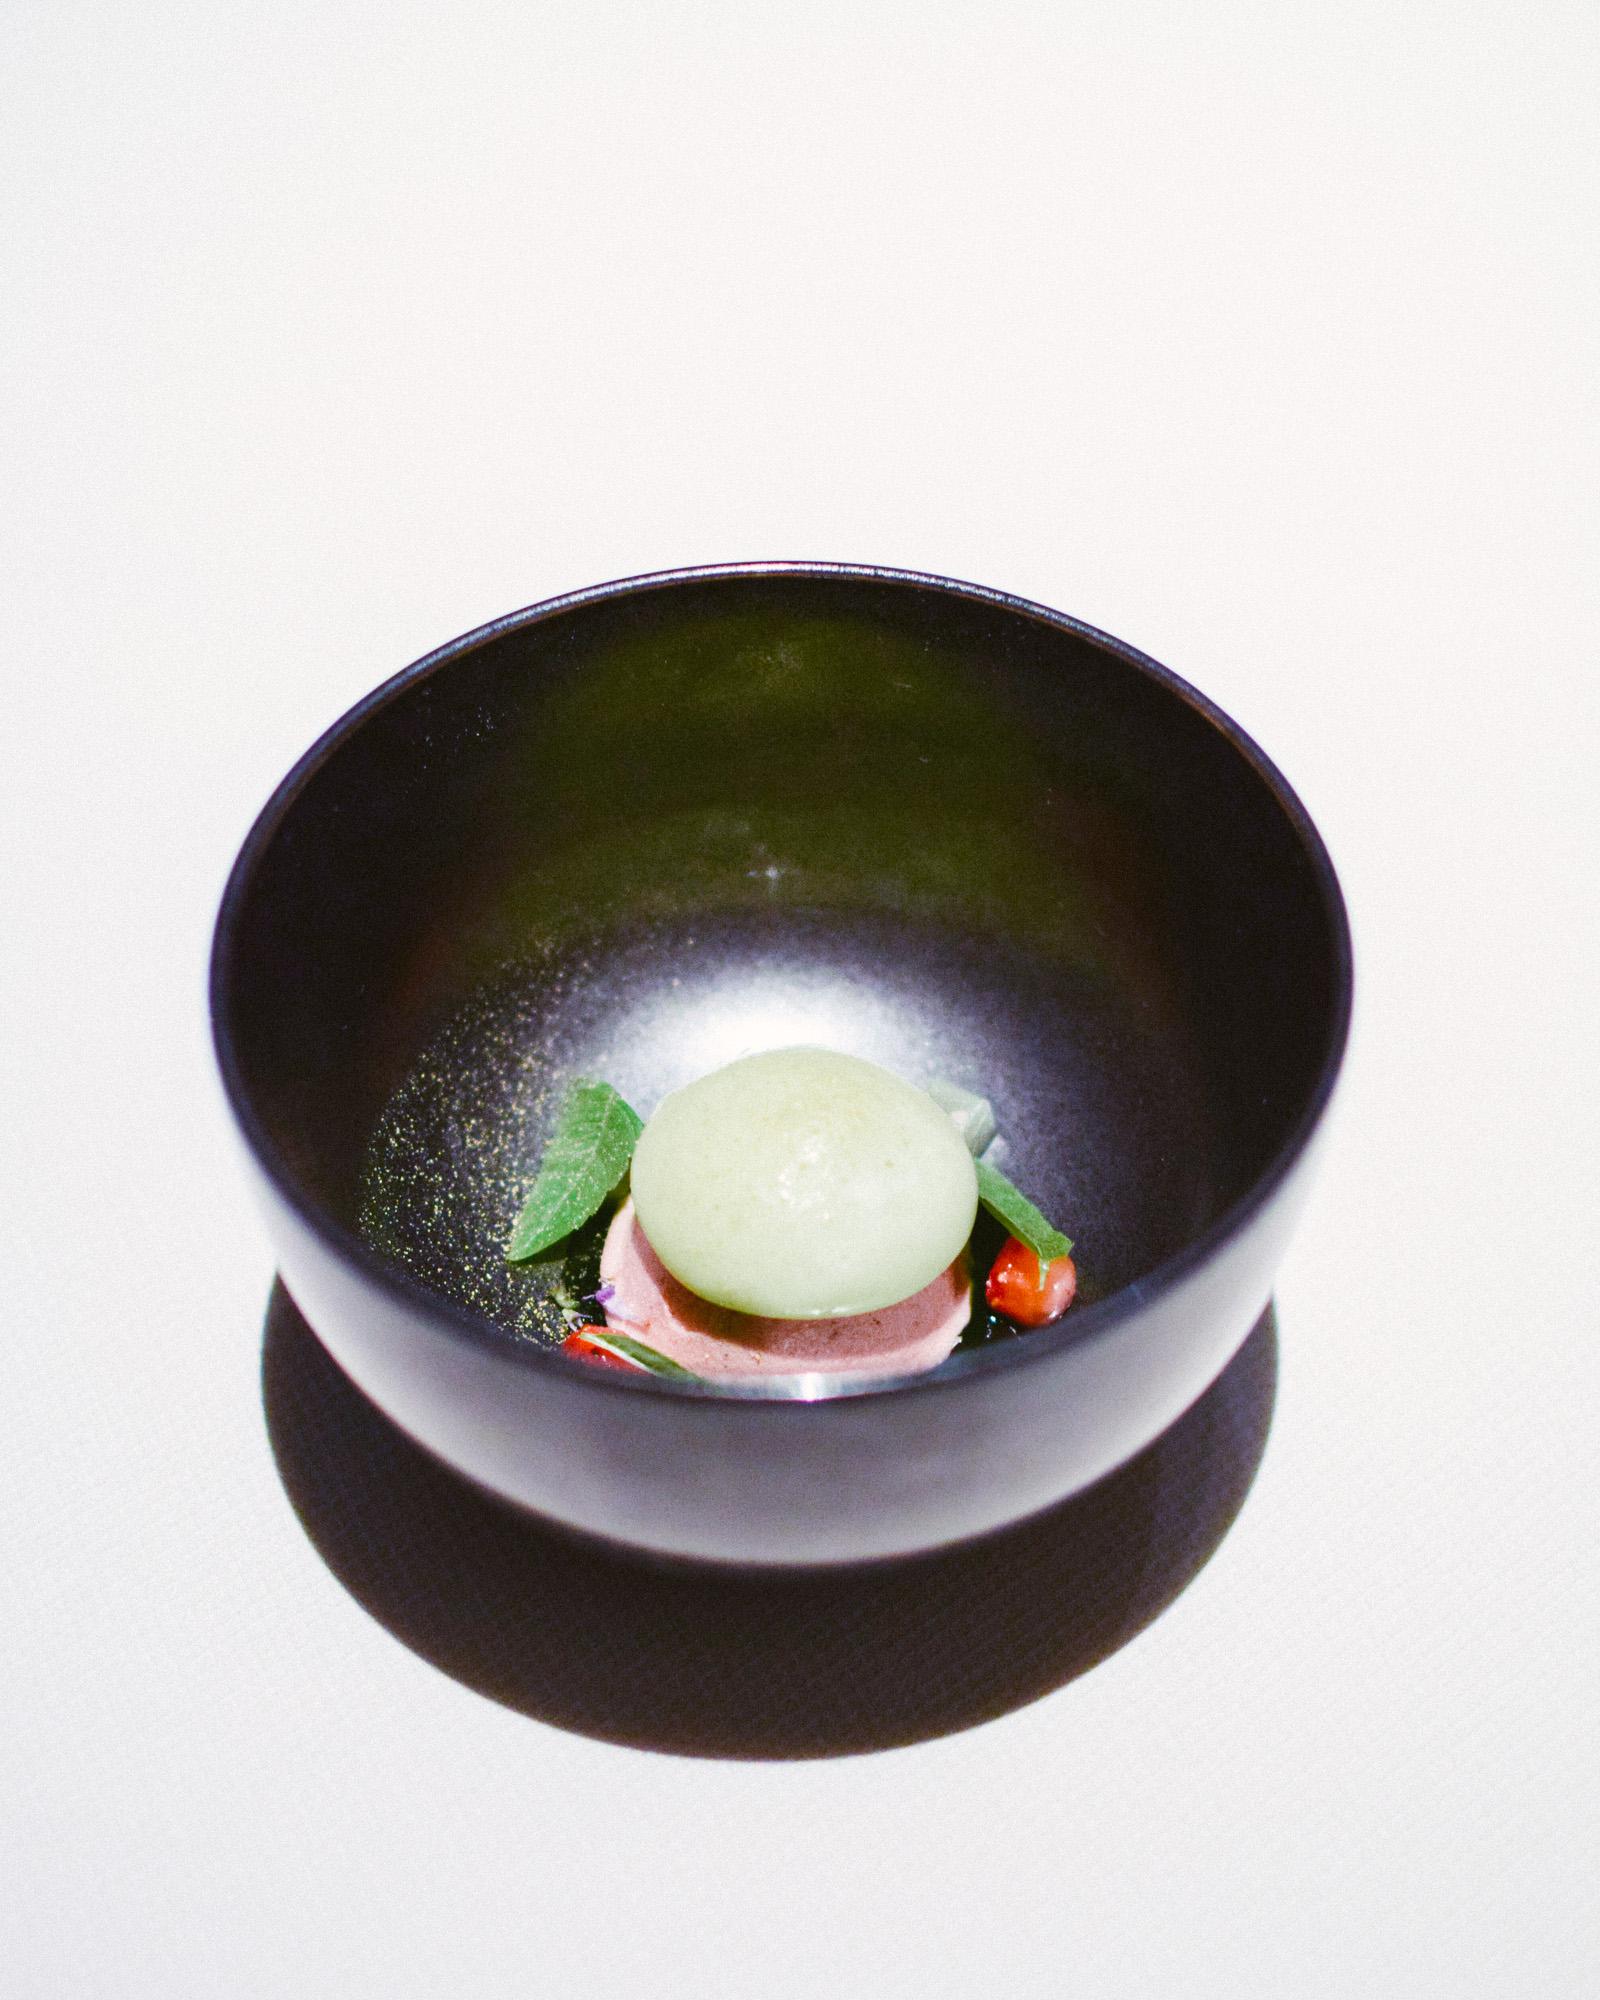 Twelfth Course: Roasted Strawberries, Cucumber, Lemon Balm